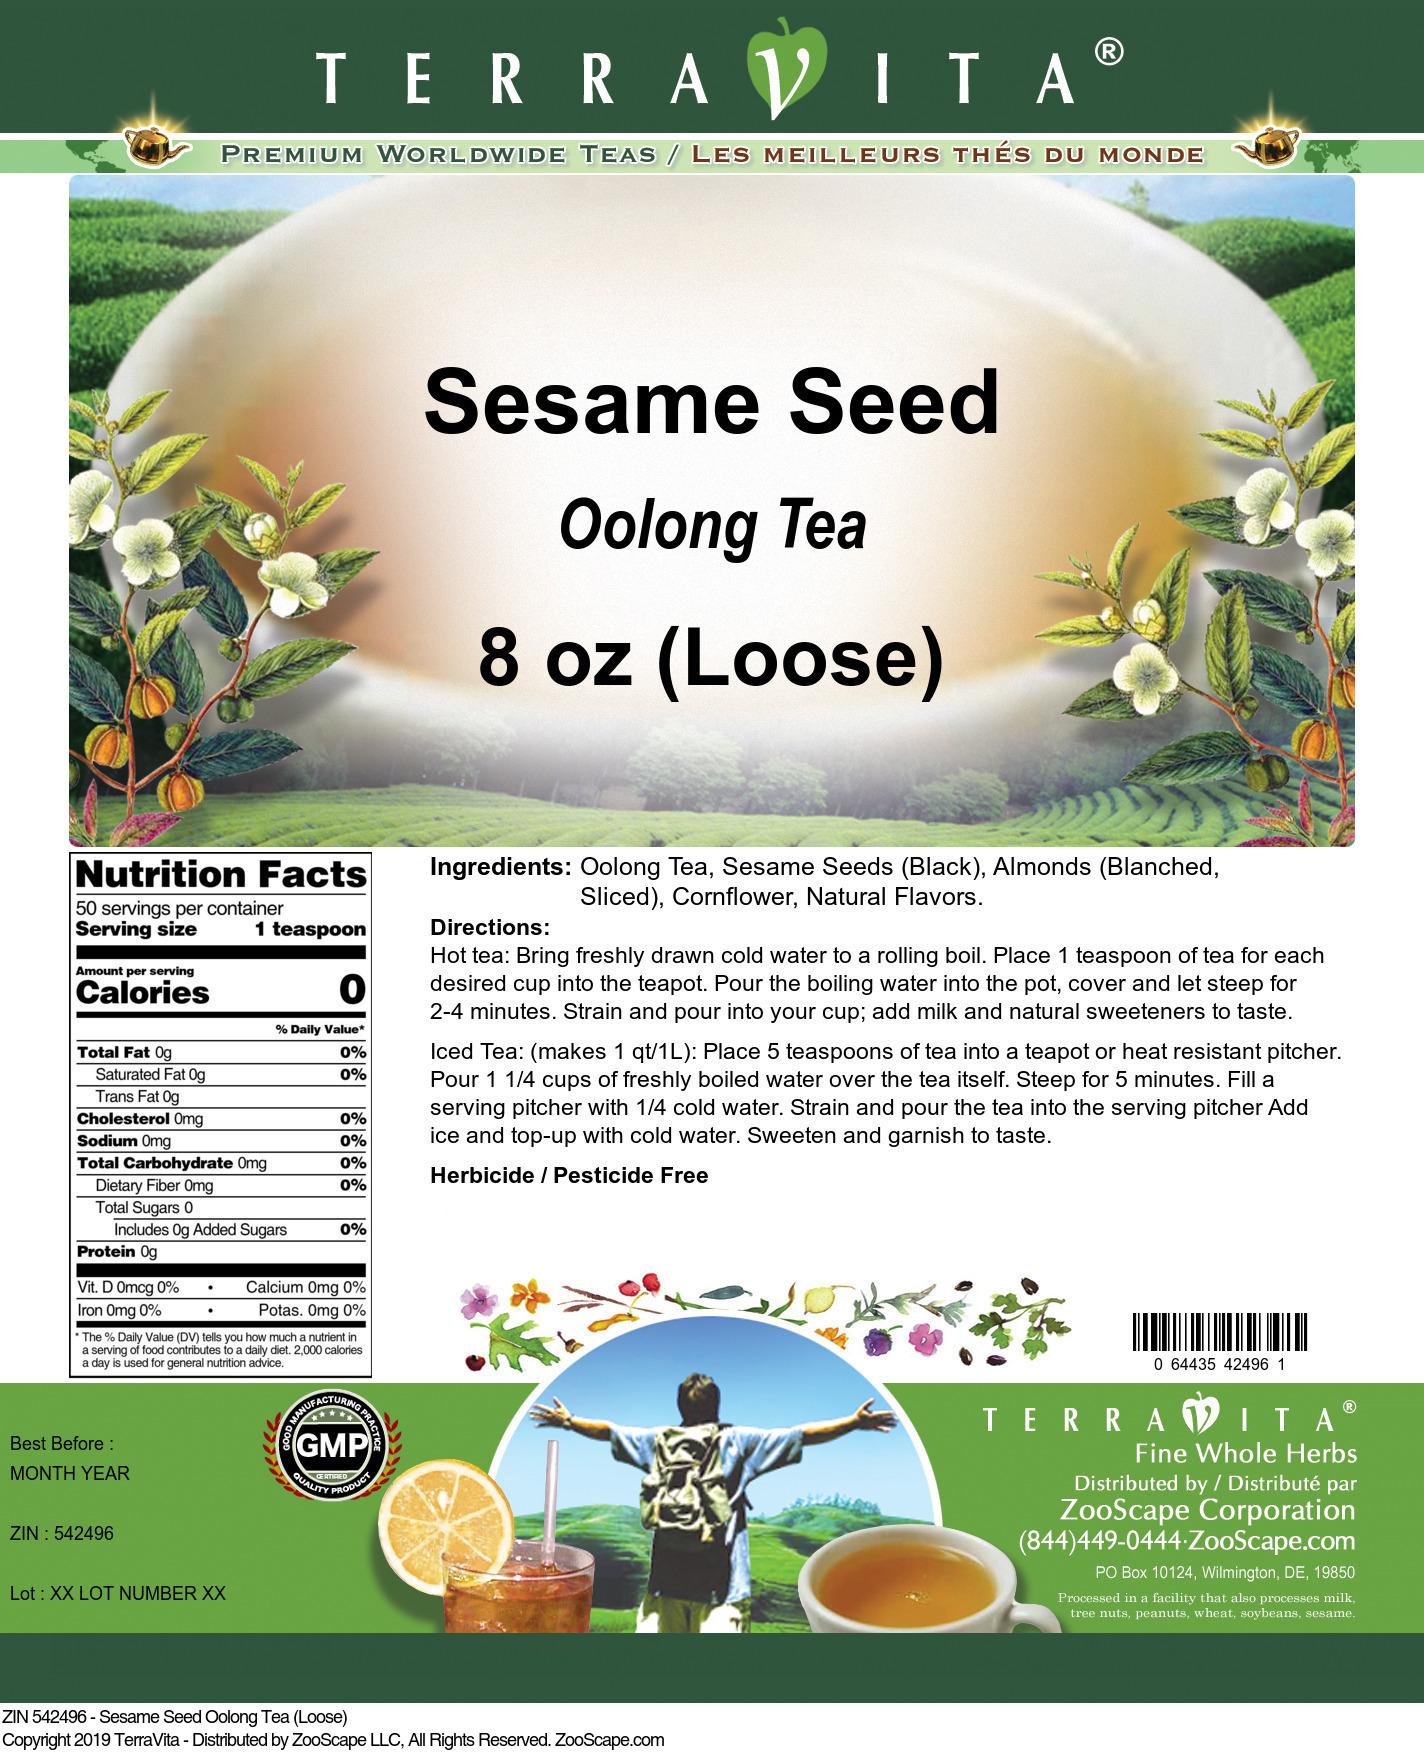 Sesame Seed Oolong Tea